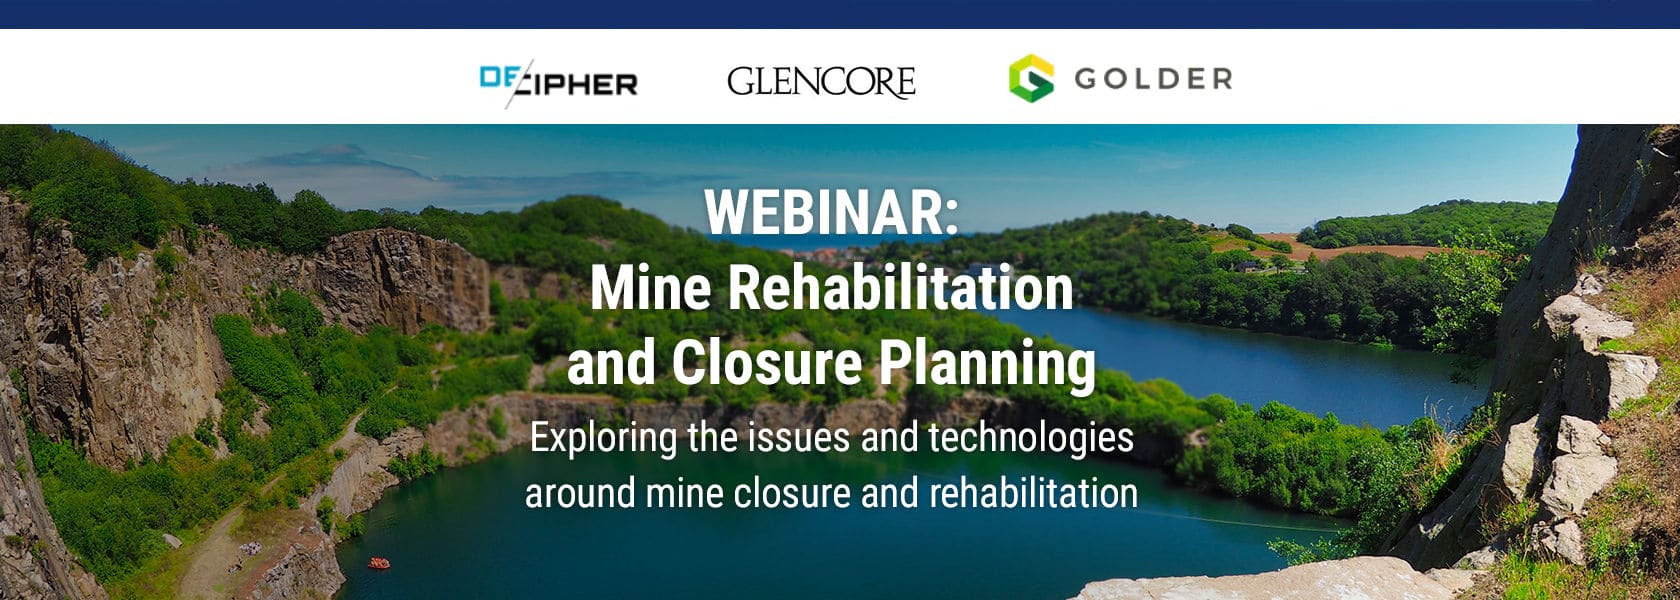 Exploring the issues & technologies around mine closure